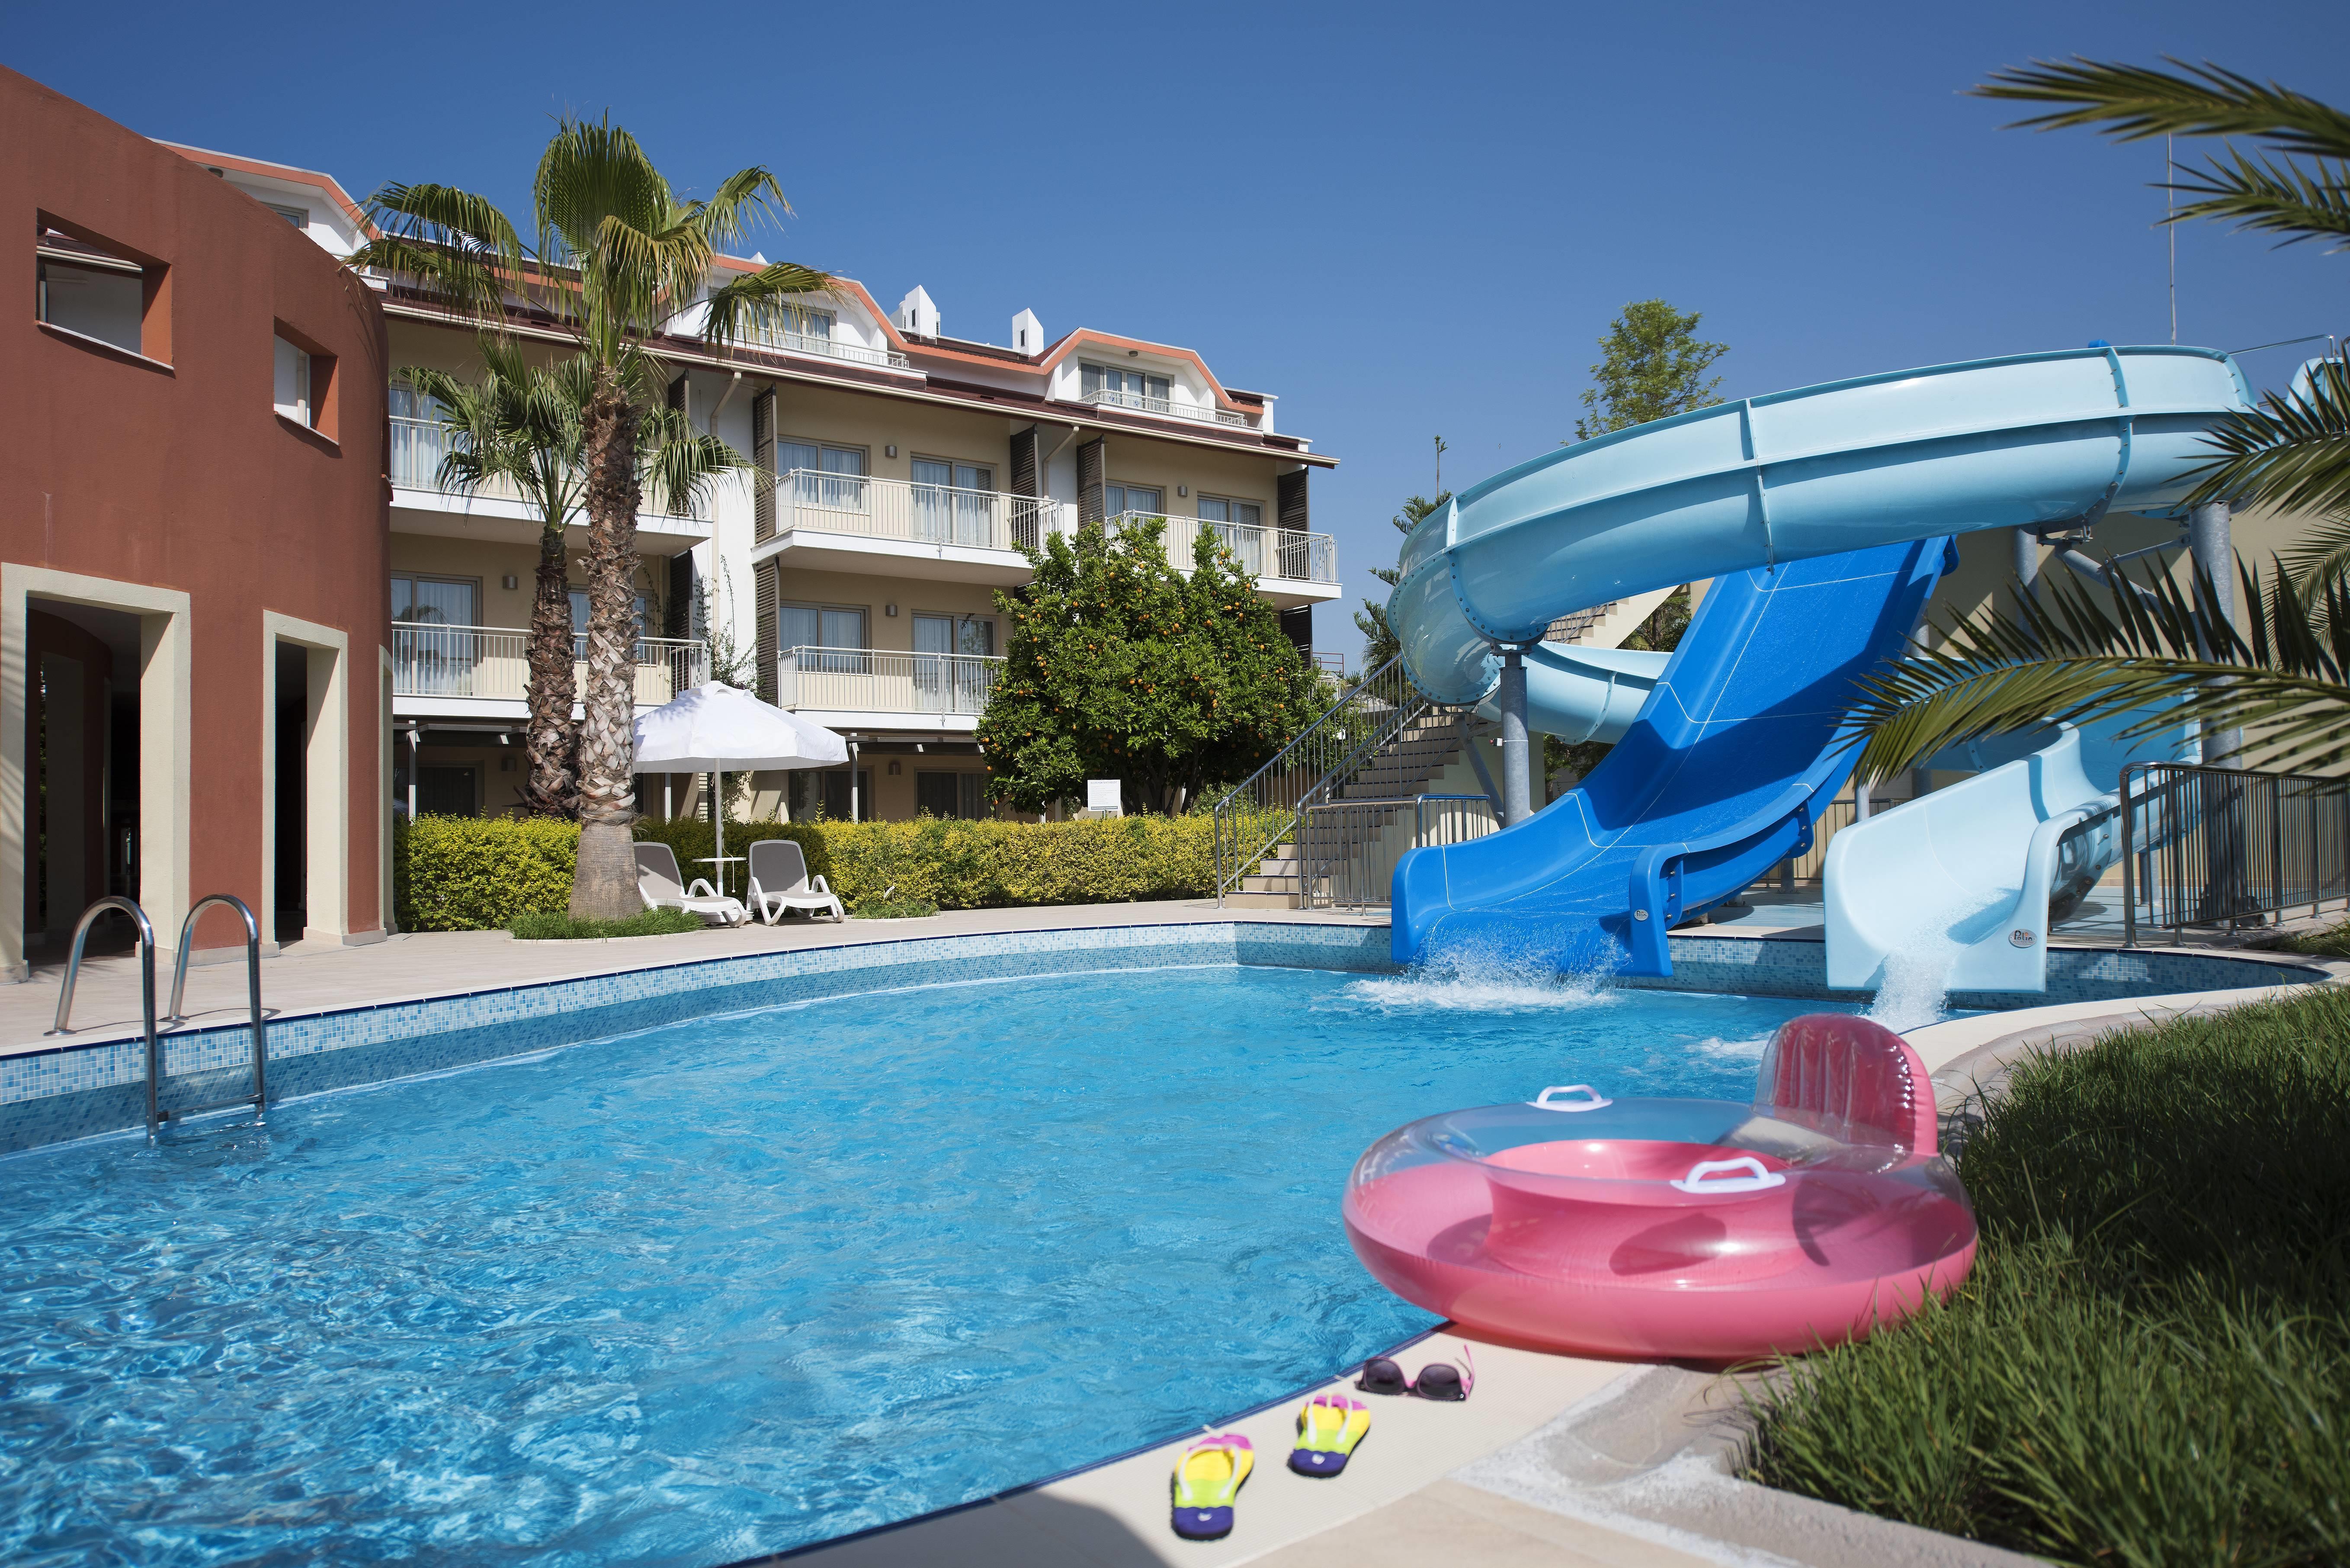 Barut B Suites 4* - bazén so šmýkačkami